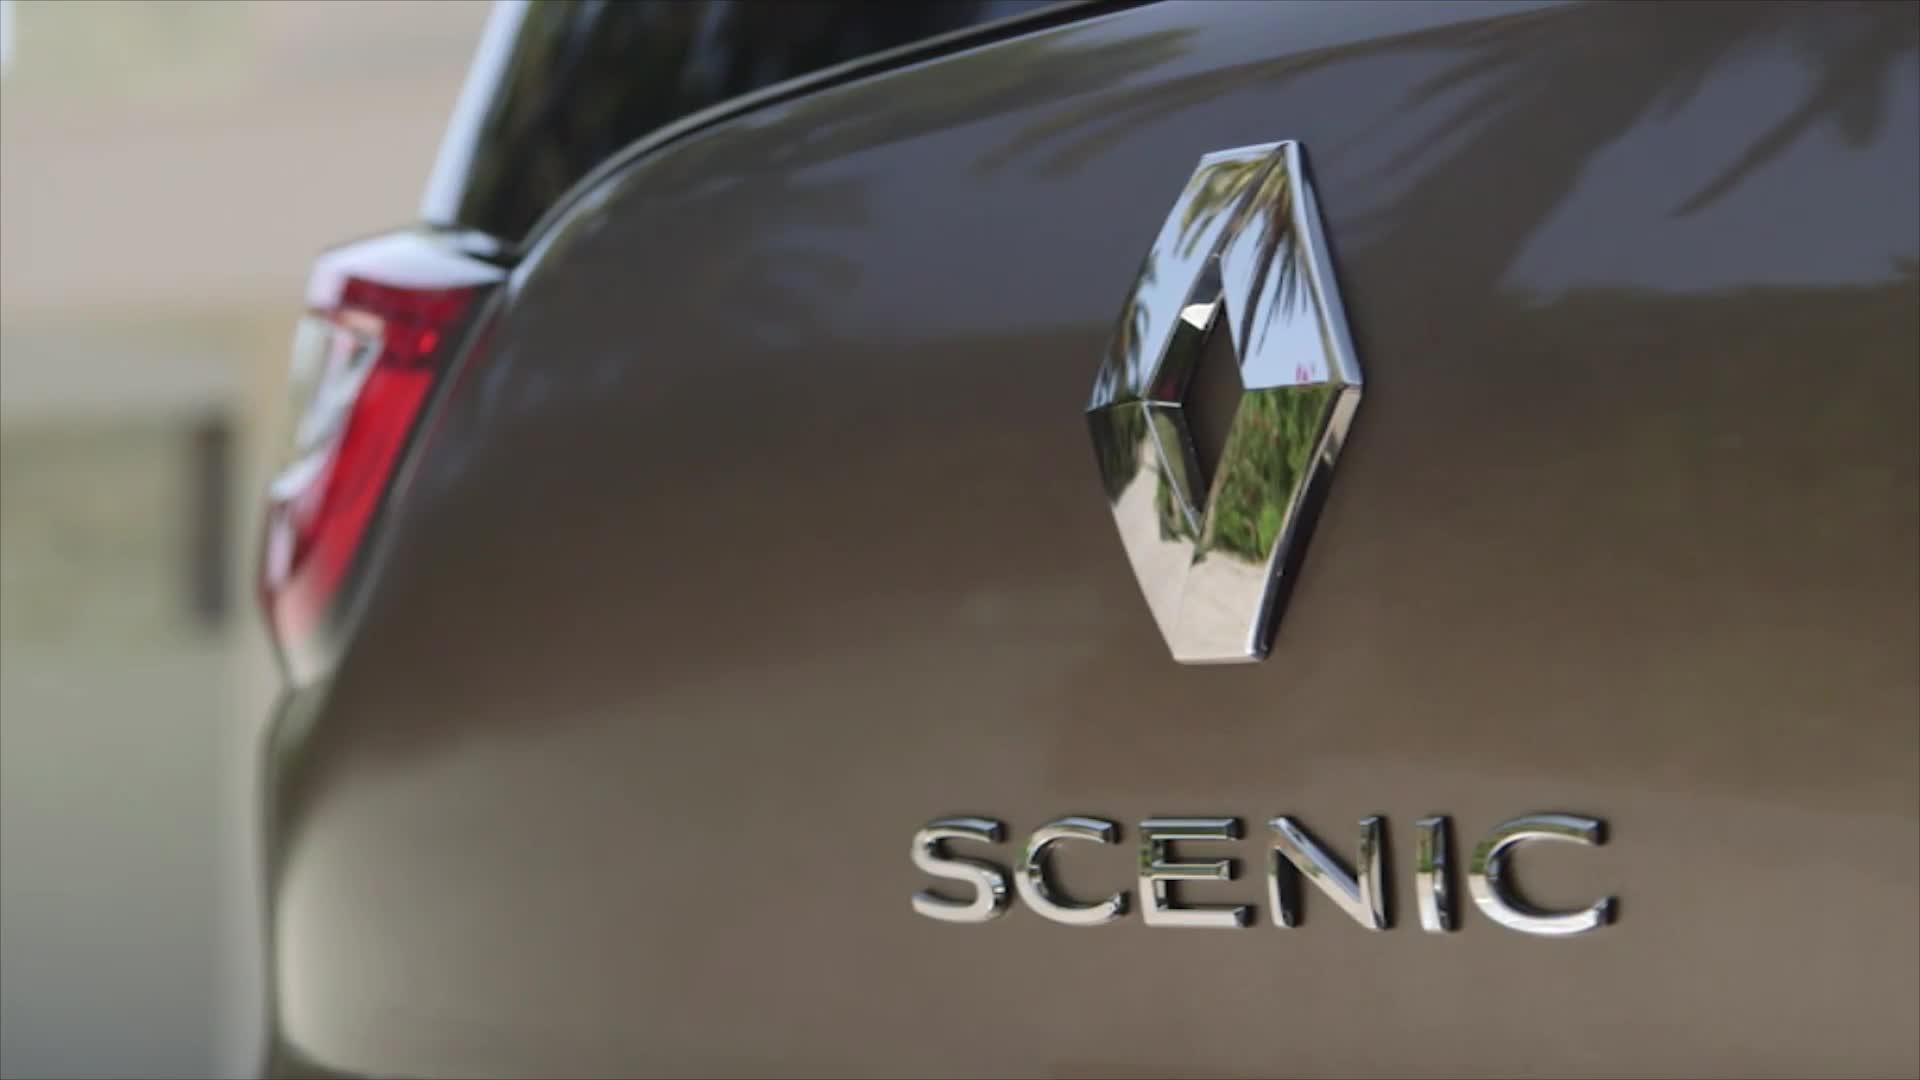 New 2016 Renault GRAND SCENIC Design Preview